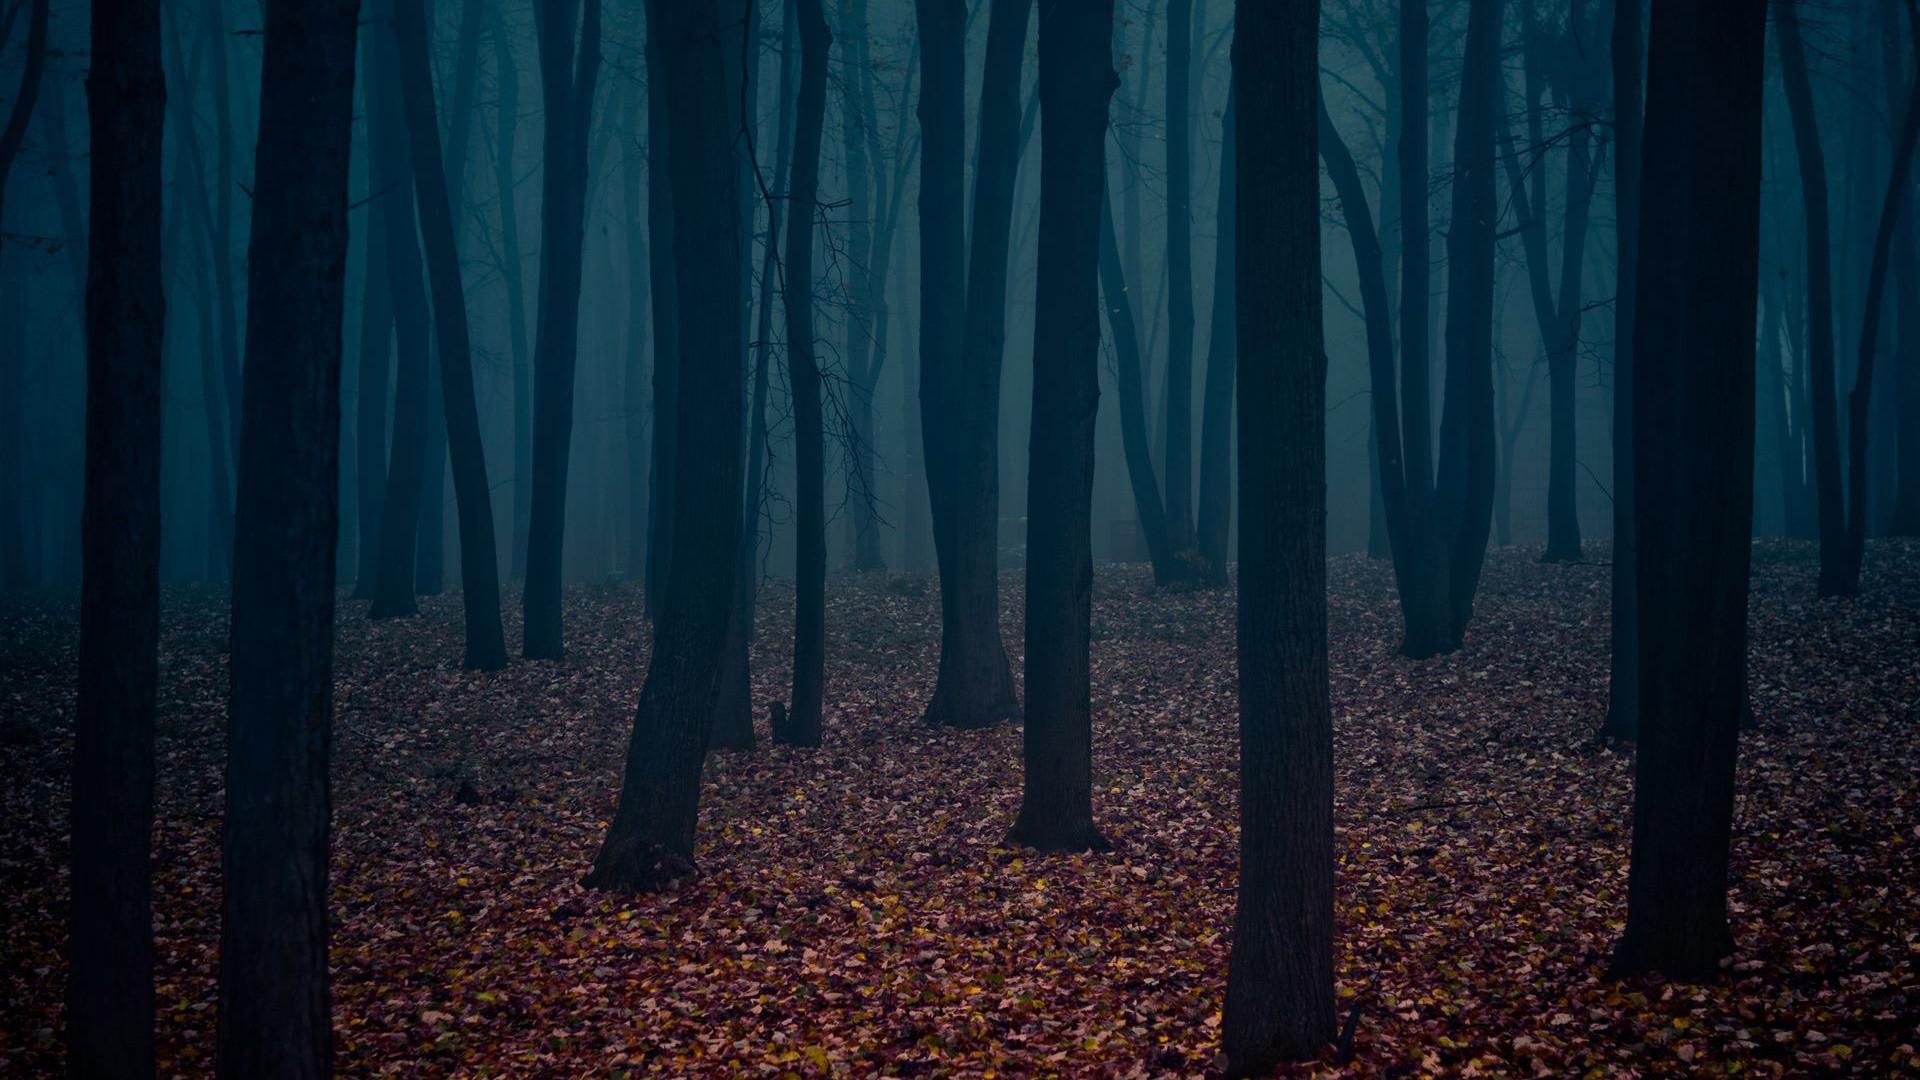 pin Dark clipart creepy forest #14